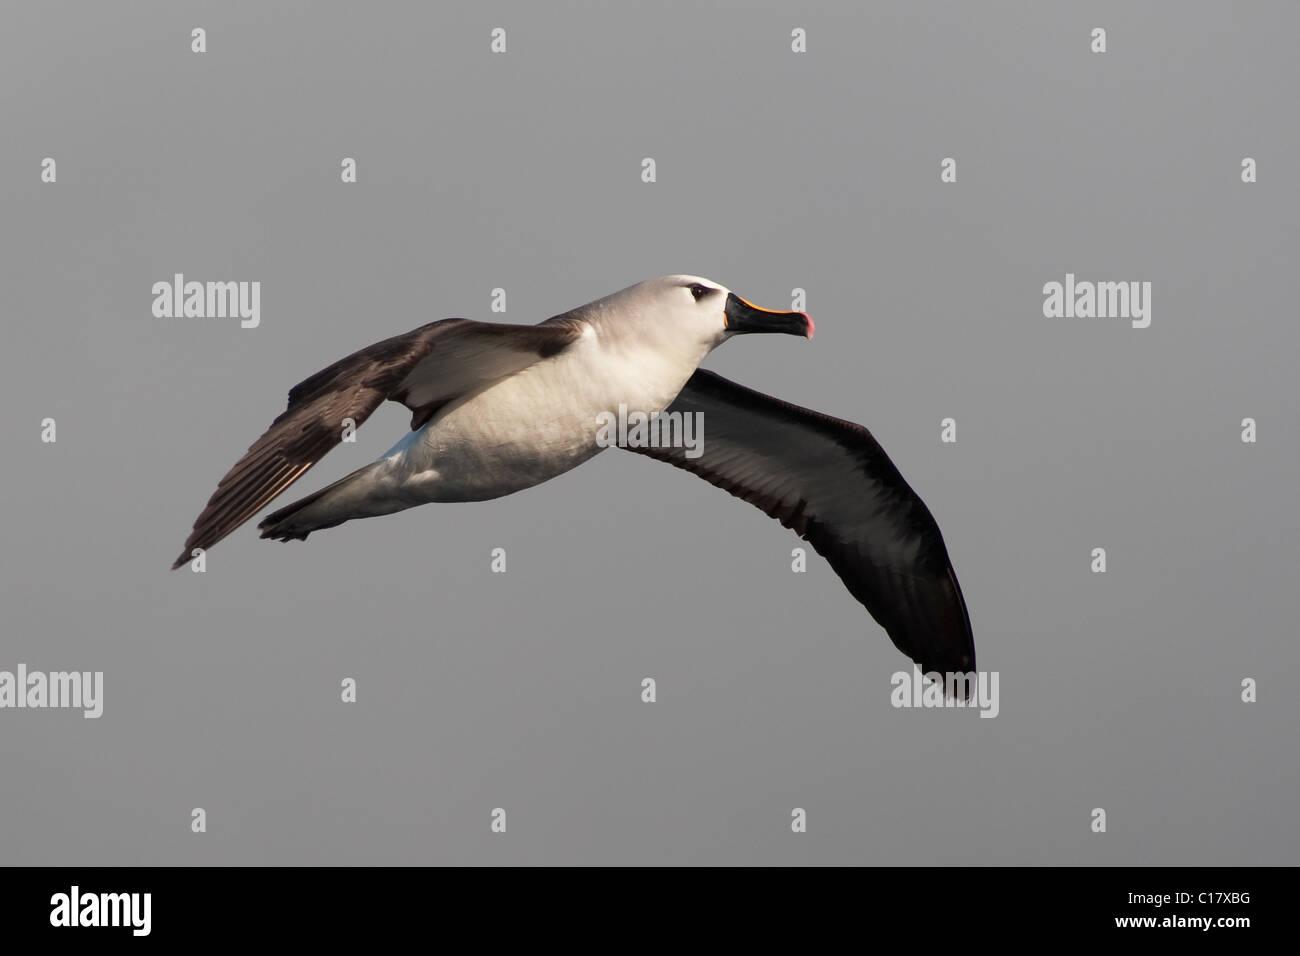 Atlantic Yellow-nosed Albatross (Thalassarche chlororhynchos chlororhynchos) adult bird soaring. - Stock Image